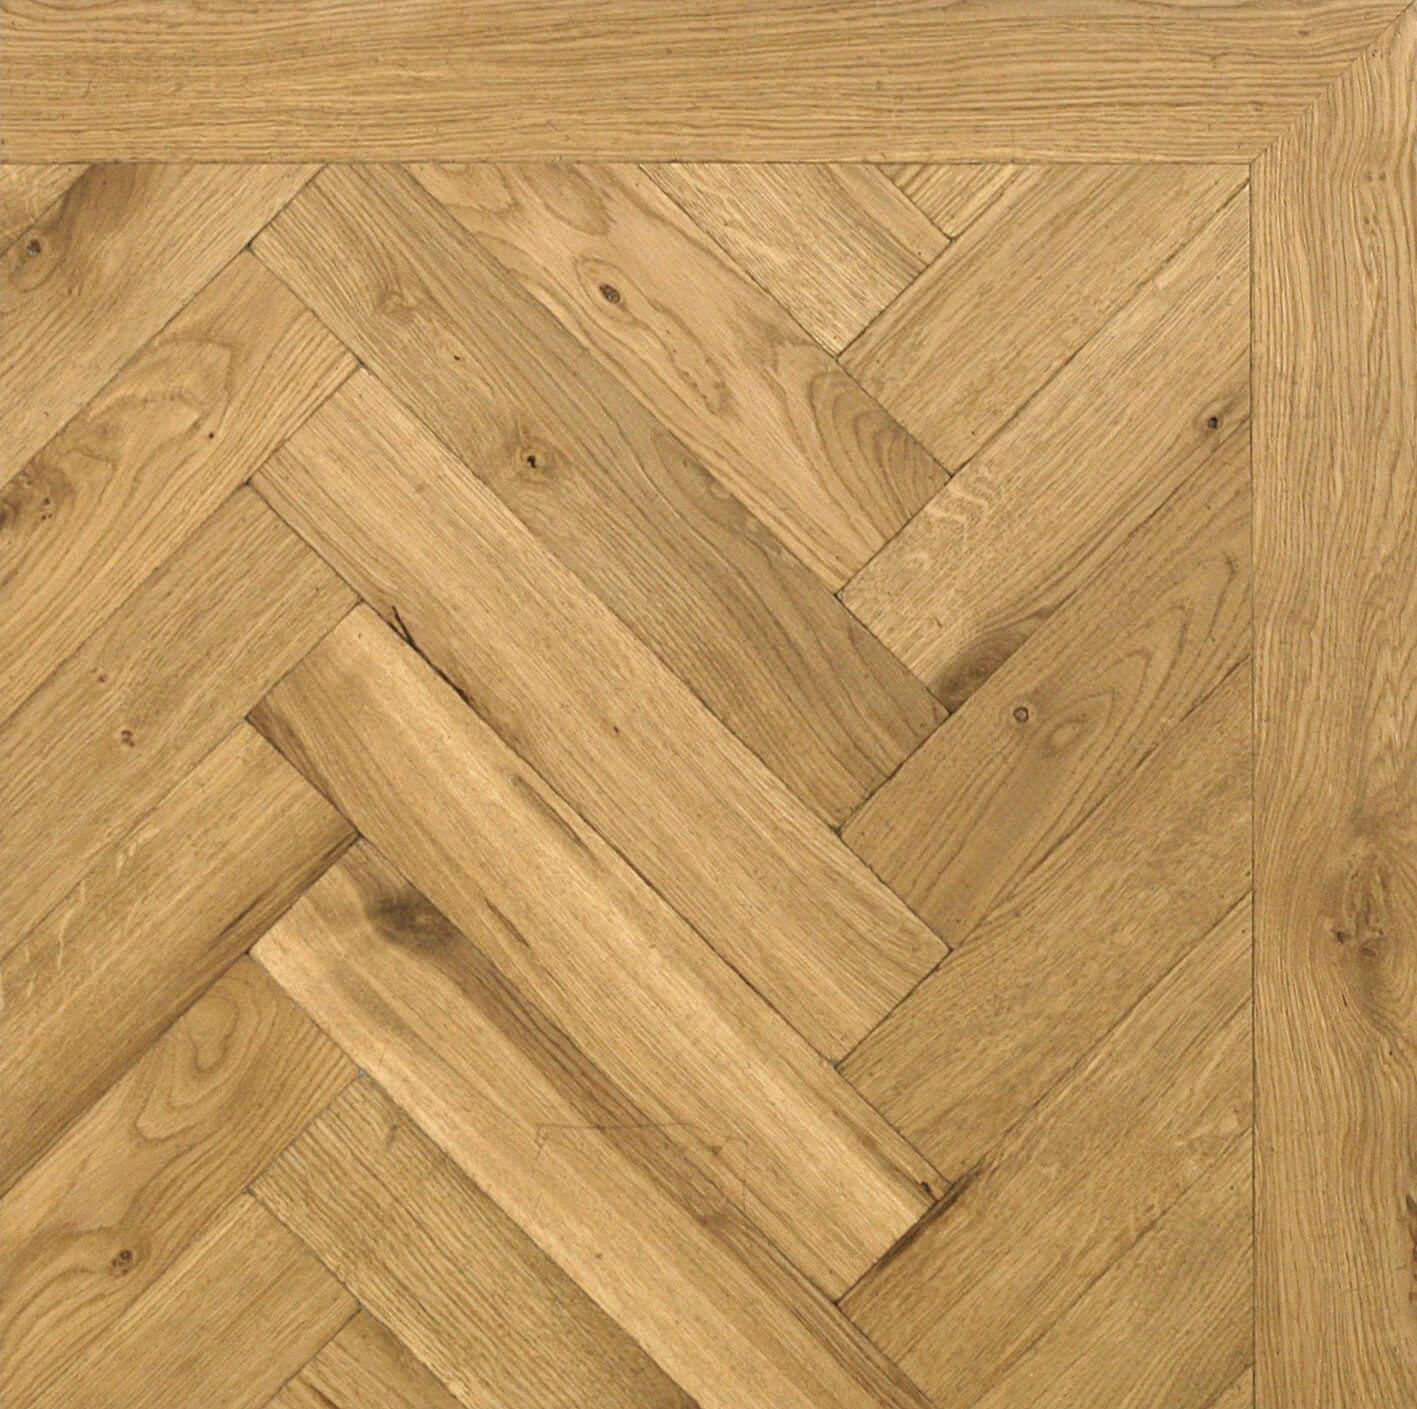 European Rustic Oak Parquet Battens Gjp Flooring